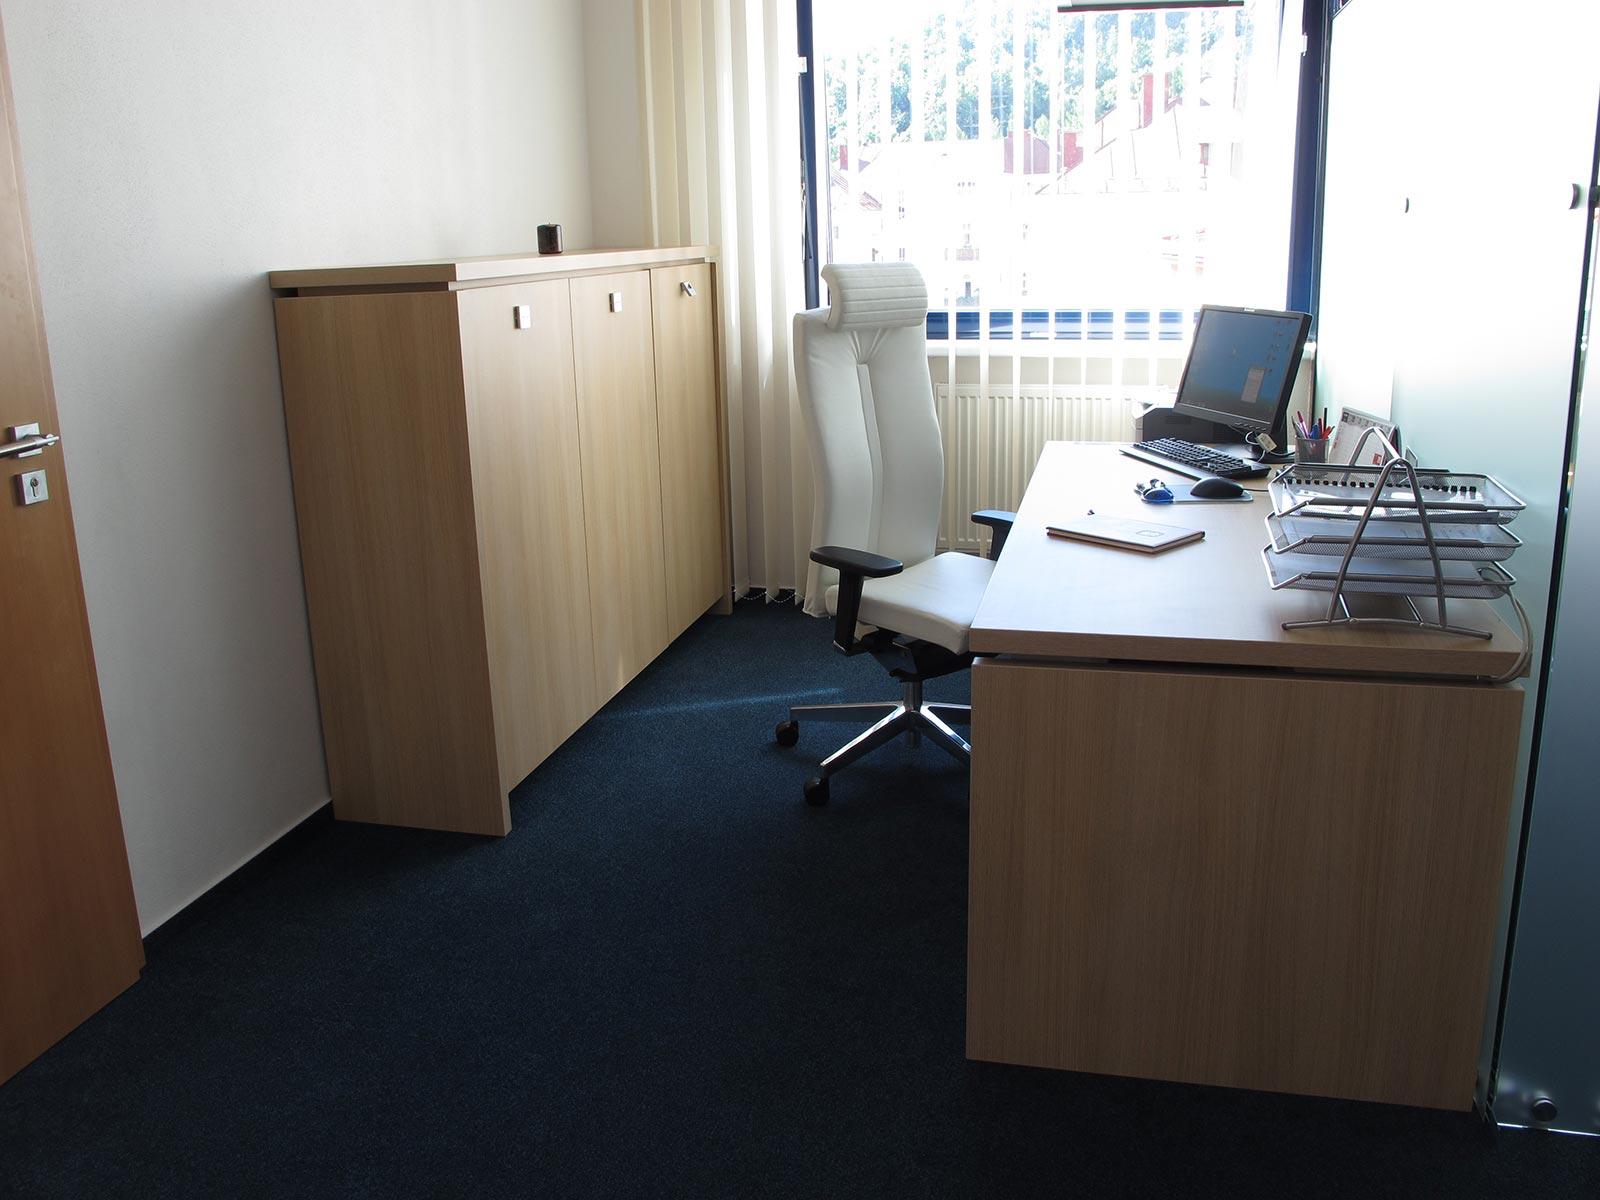 statna-opera-kancelaria.jpg